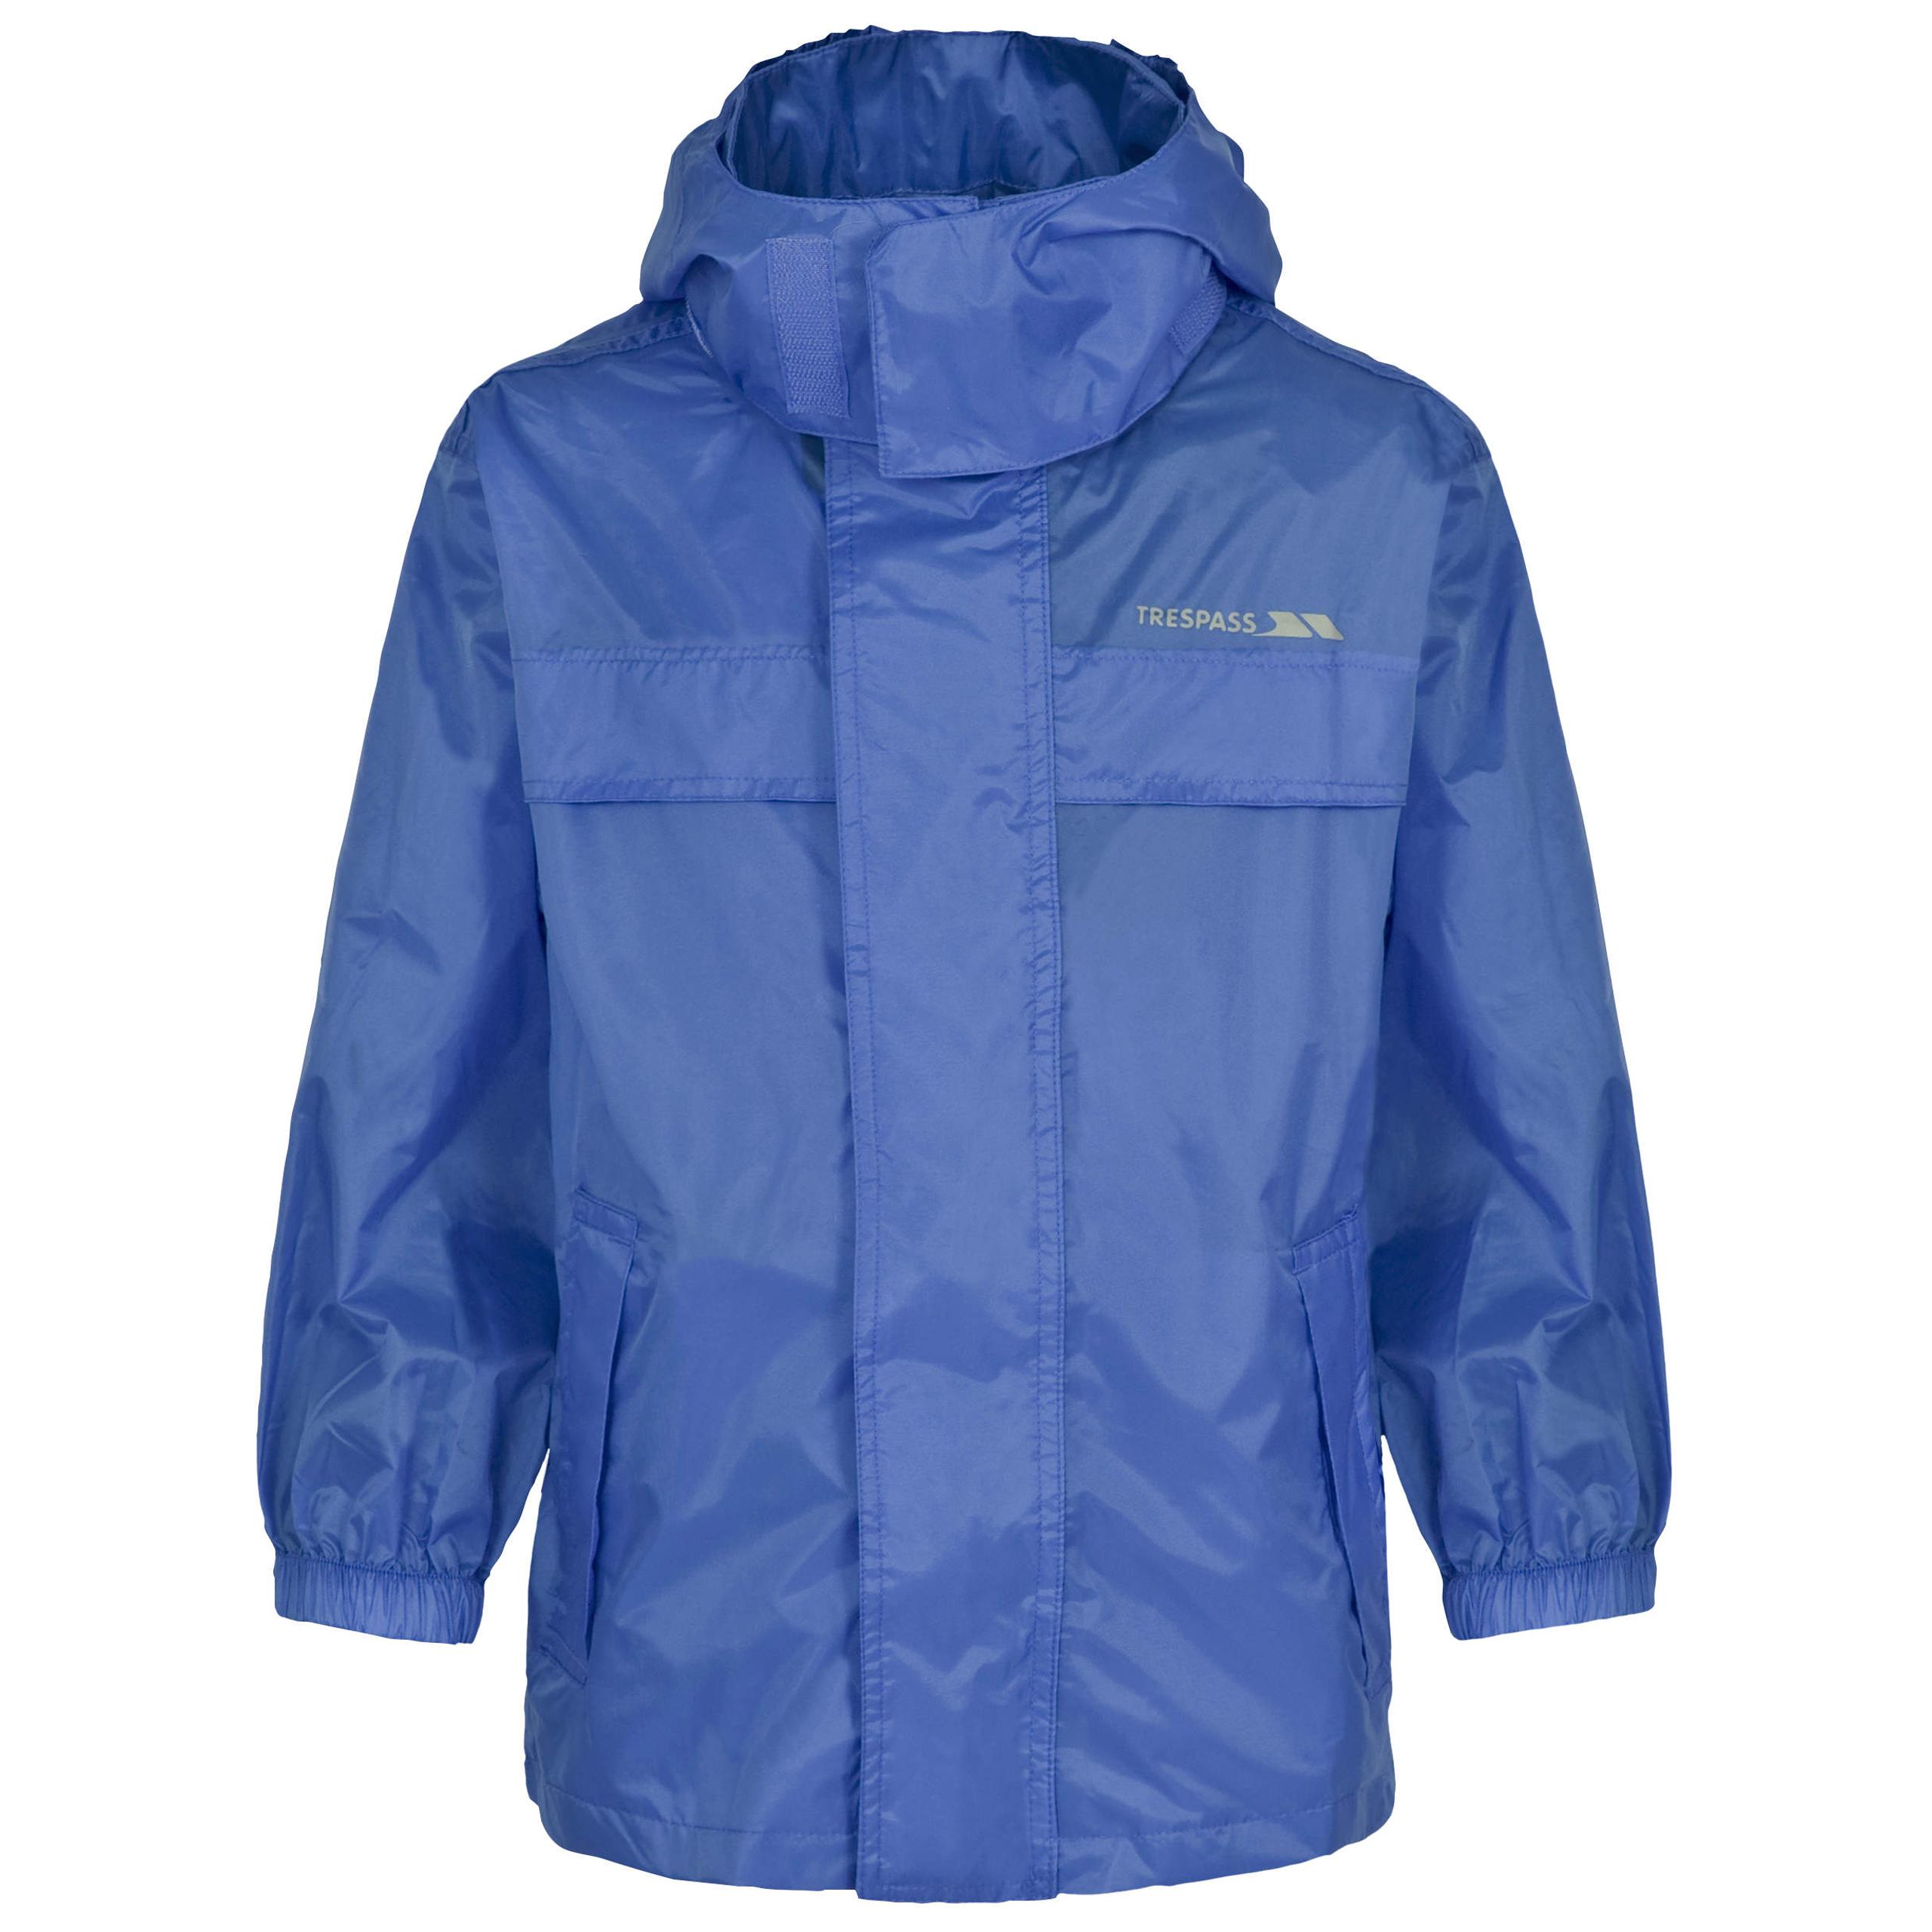 Trespass-Packa-Kids-Waterproof-Jacket-Lightweight-Windproof-Girls-Boys-Raincoat thumbnail 20